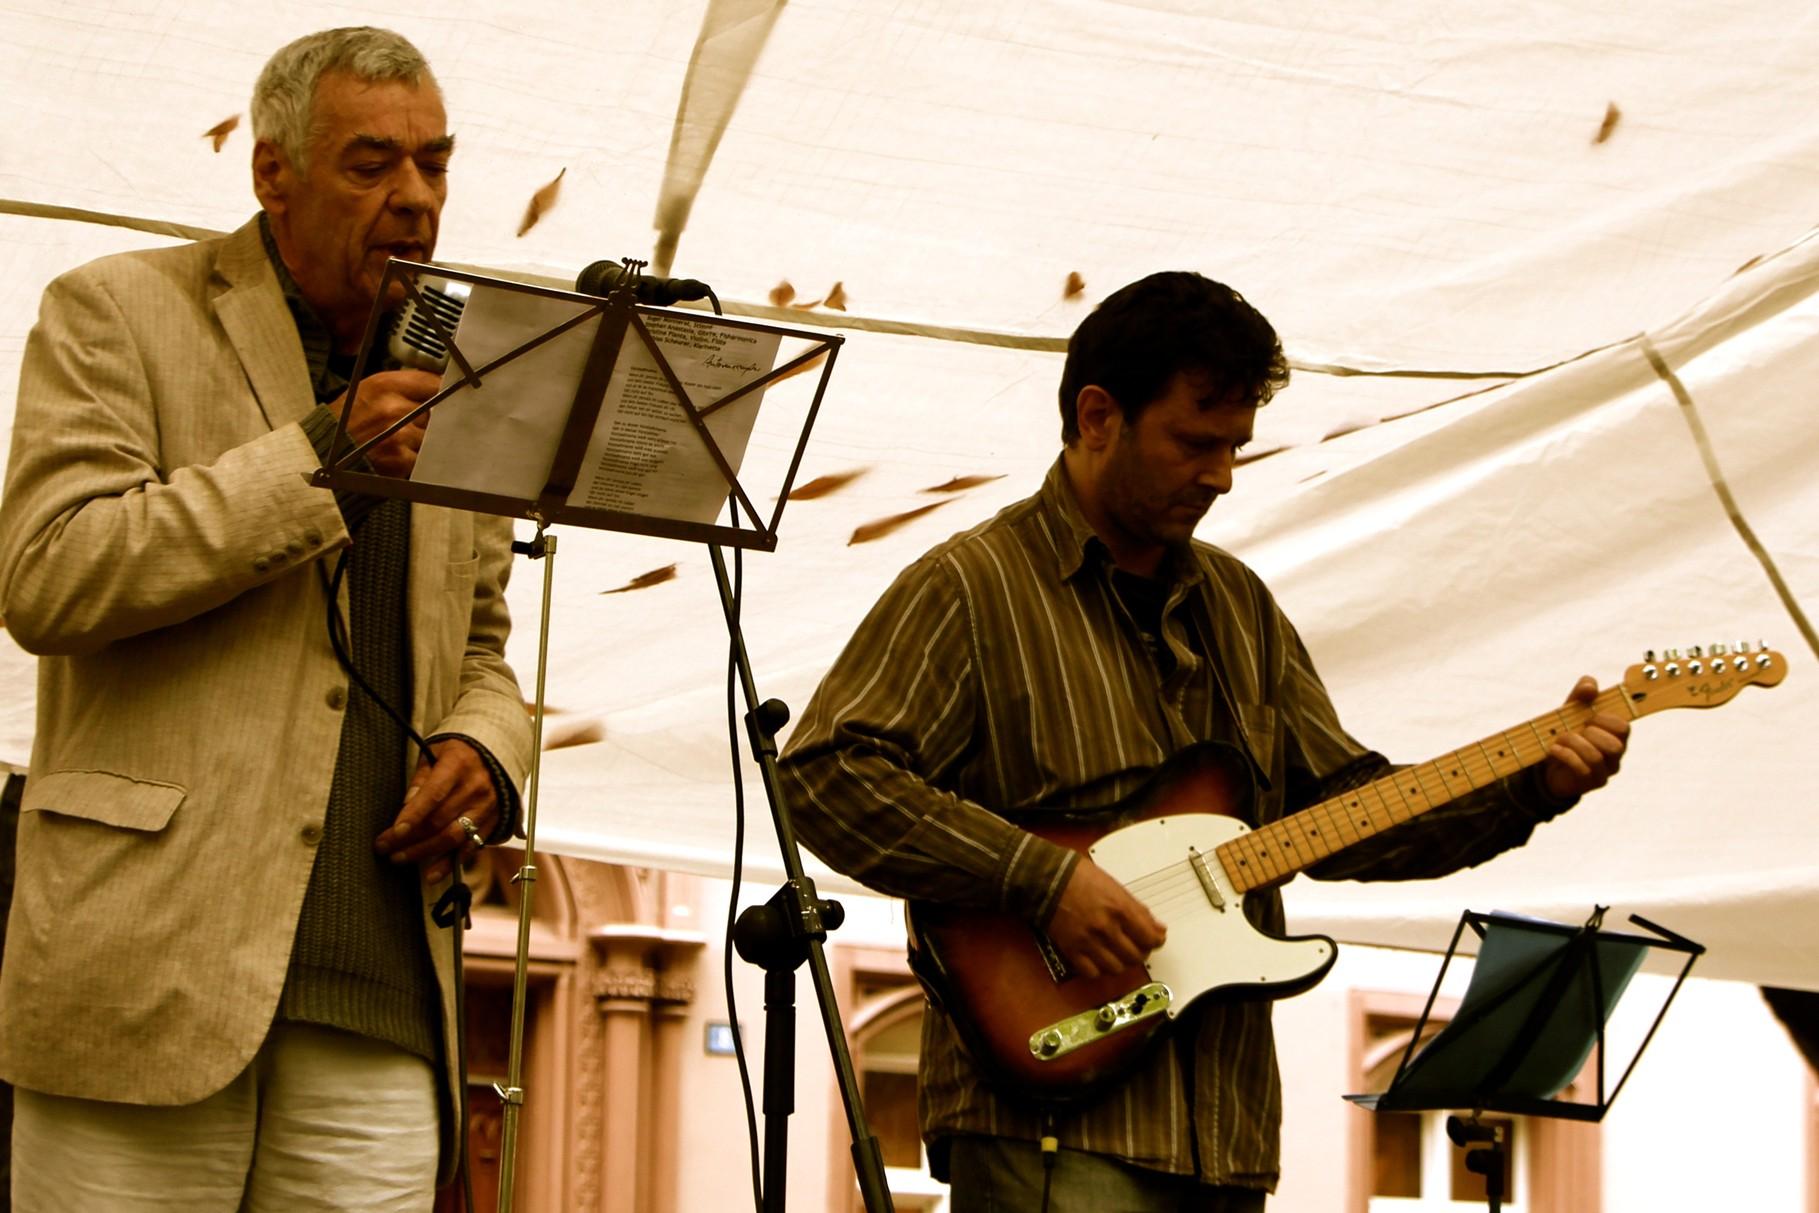 Roger Monnerat & Stephan Anastasia zeigen musikalische Poesie